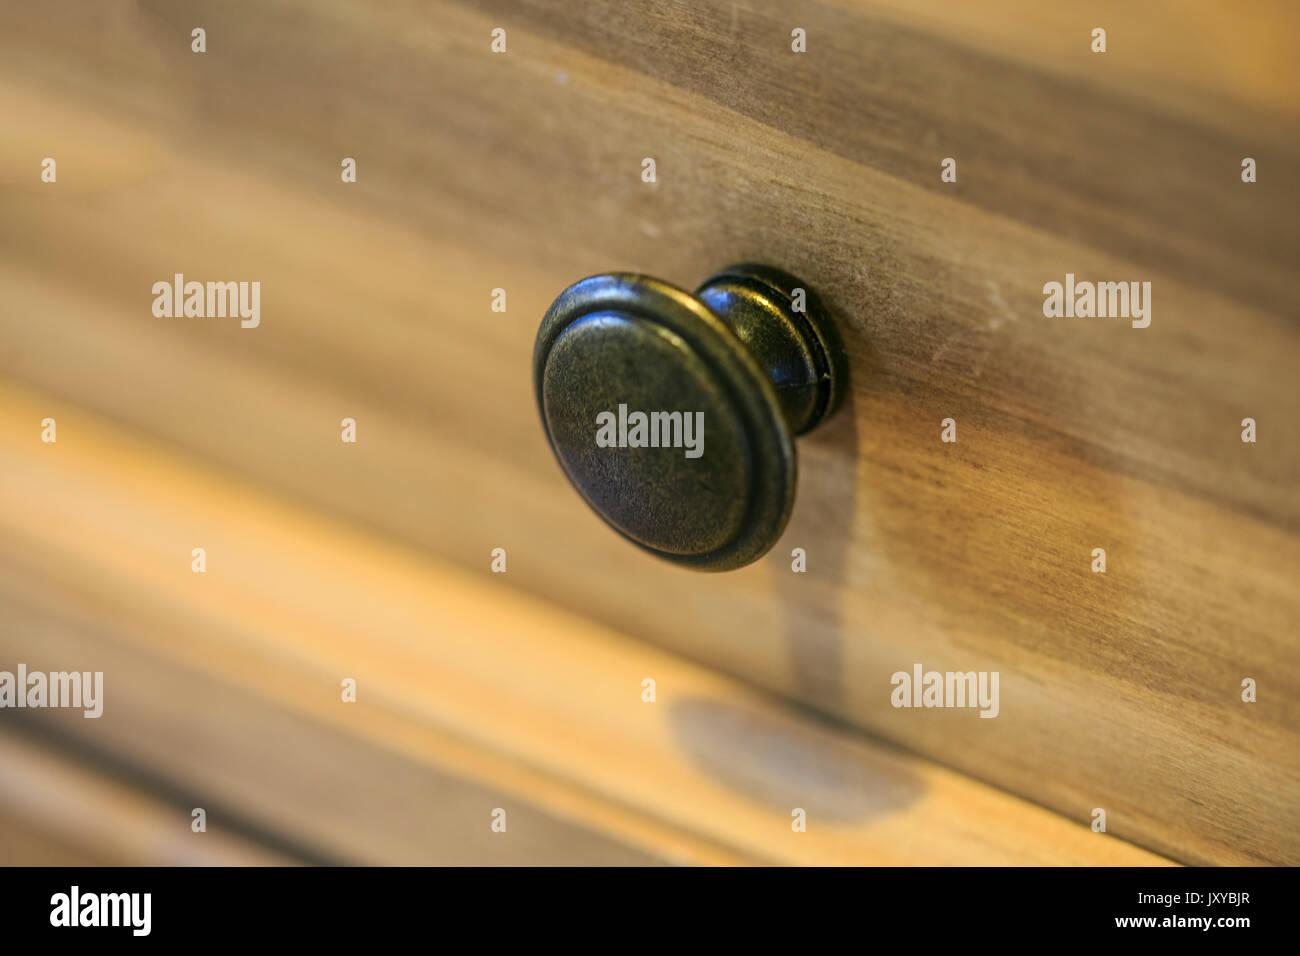 Steel drawer handle in a vintage furniture - Stock Image